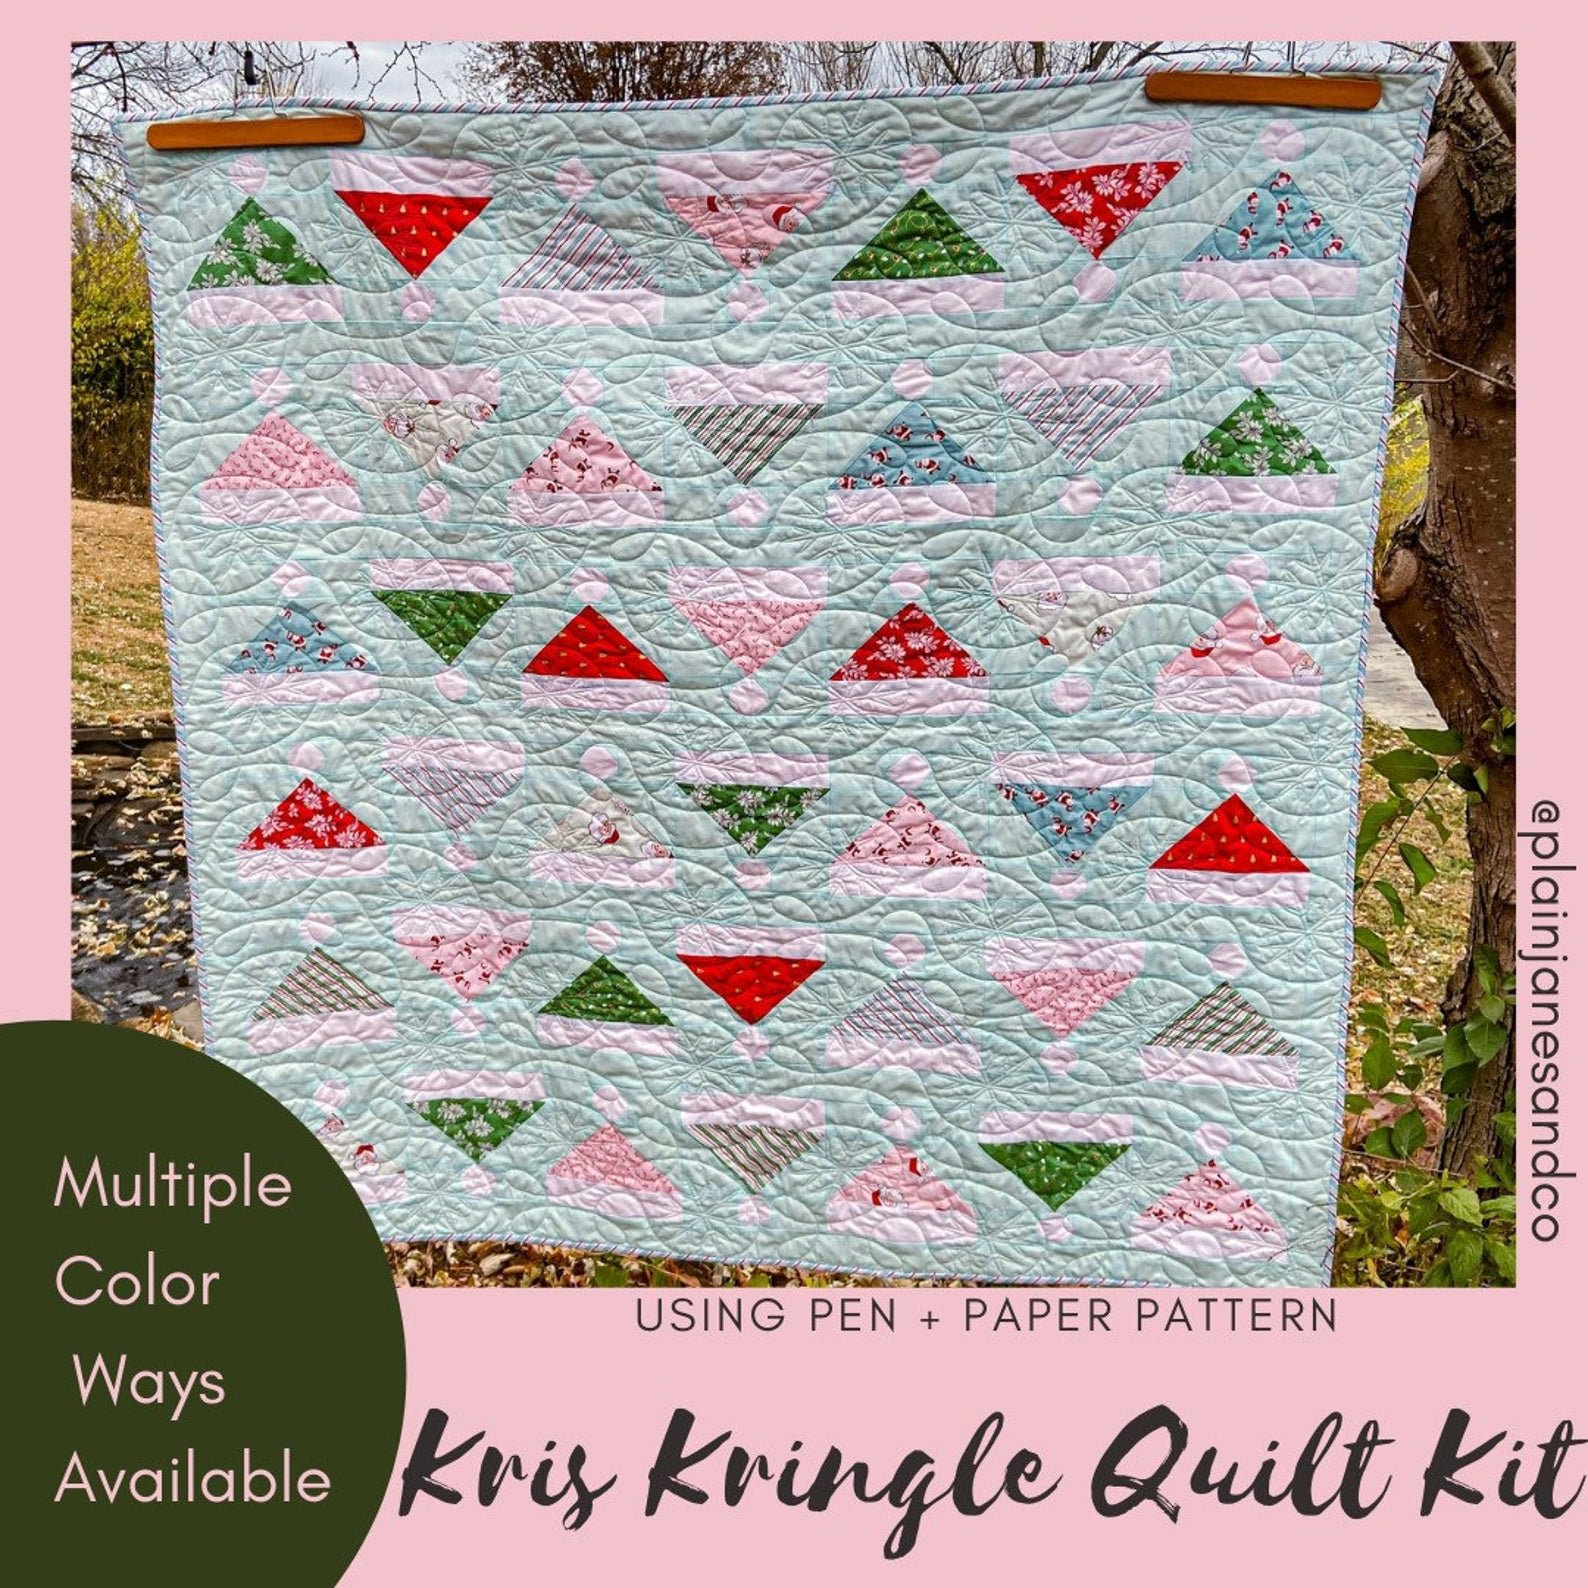 Kris Kringle Quilt Kit for Pen + Paper Patterns